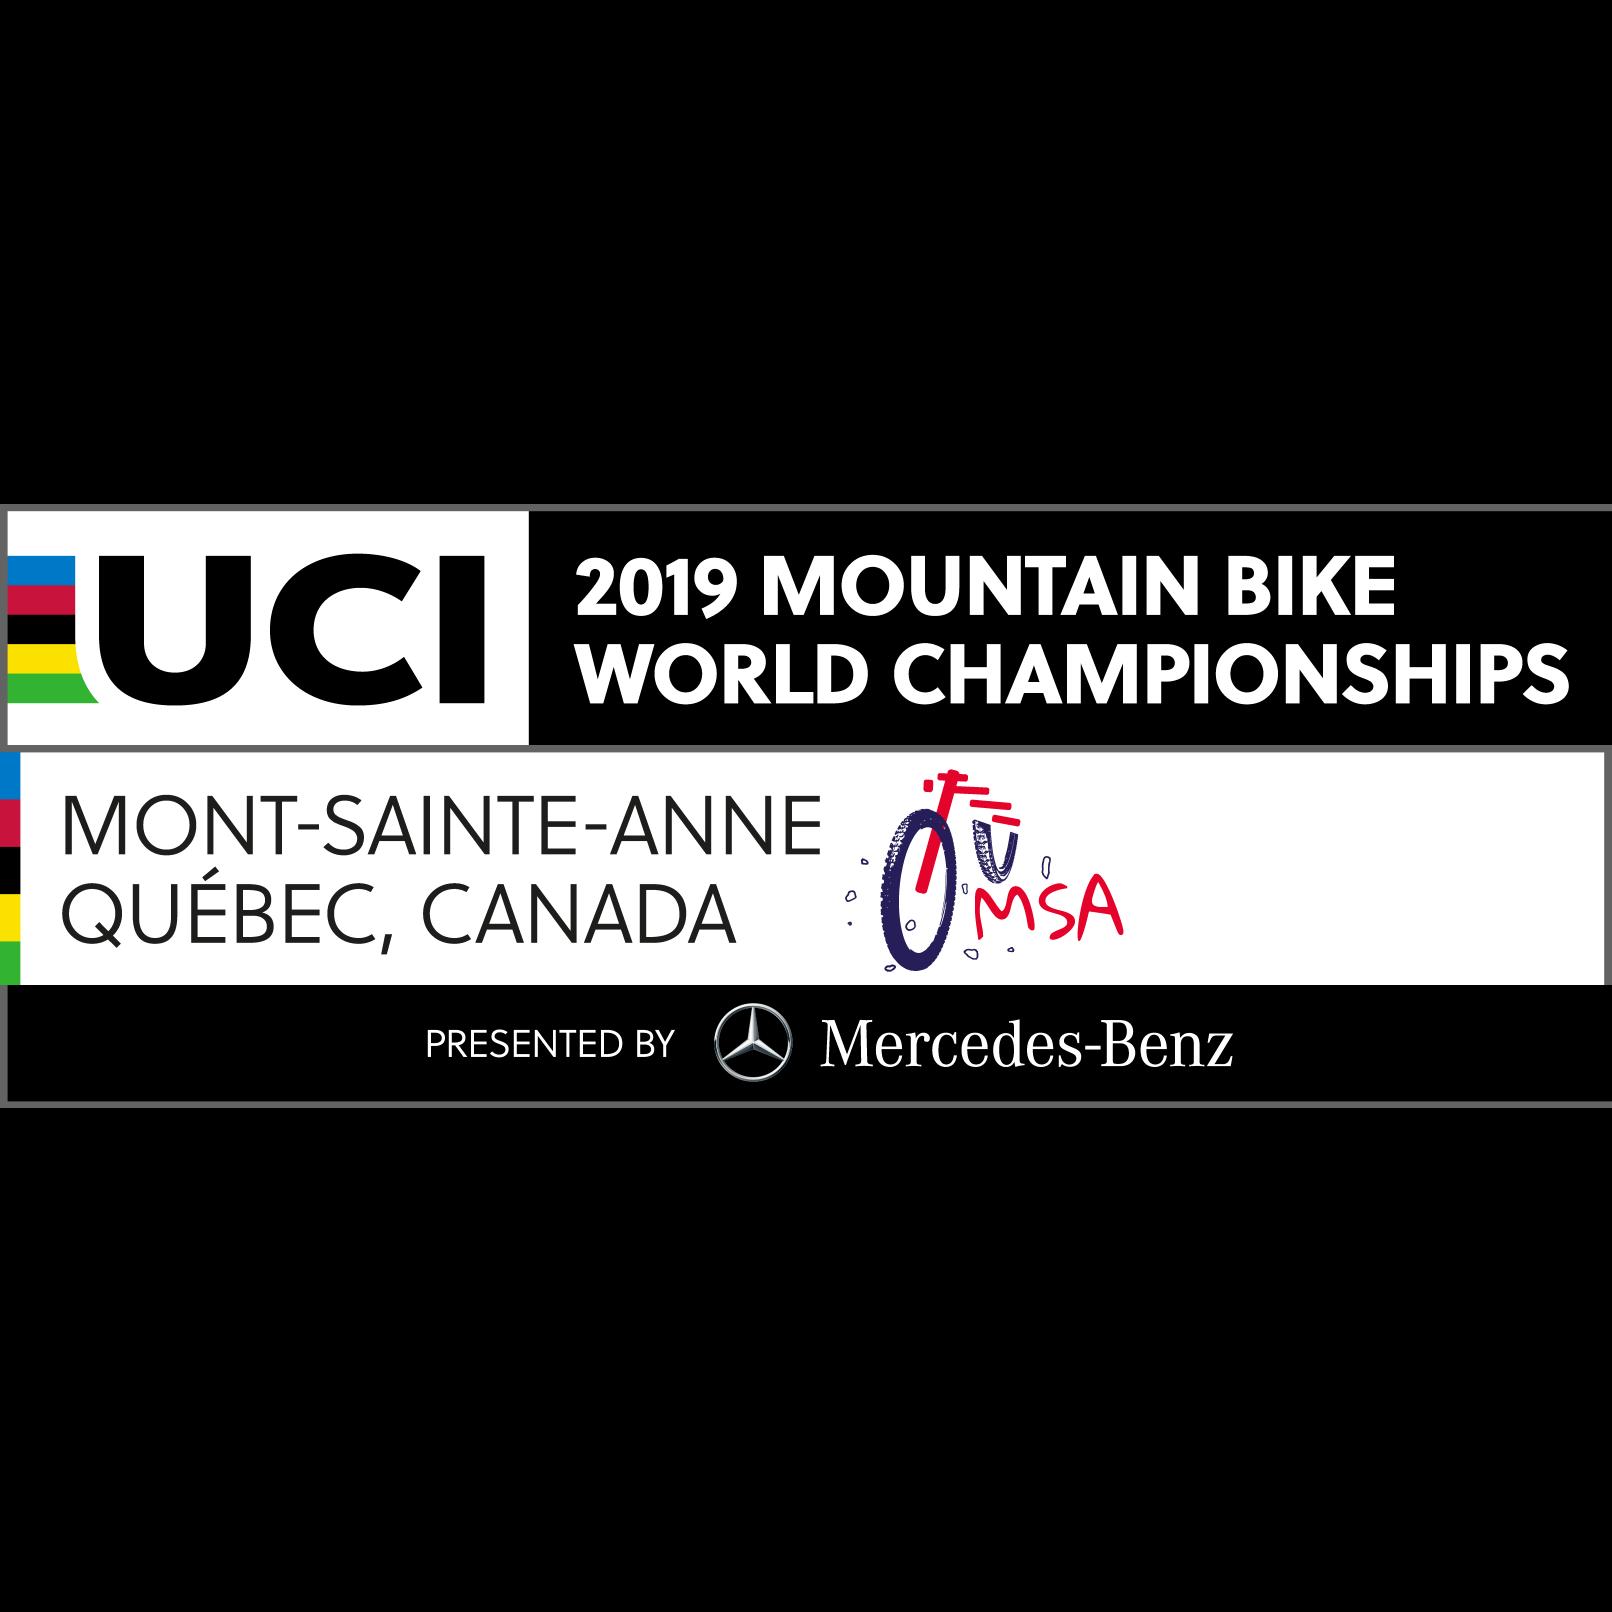 2019 UCI Mountain Bike World Championships